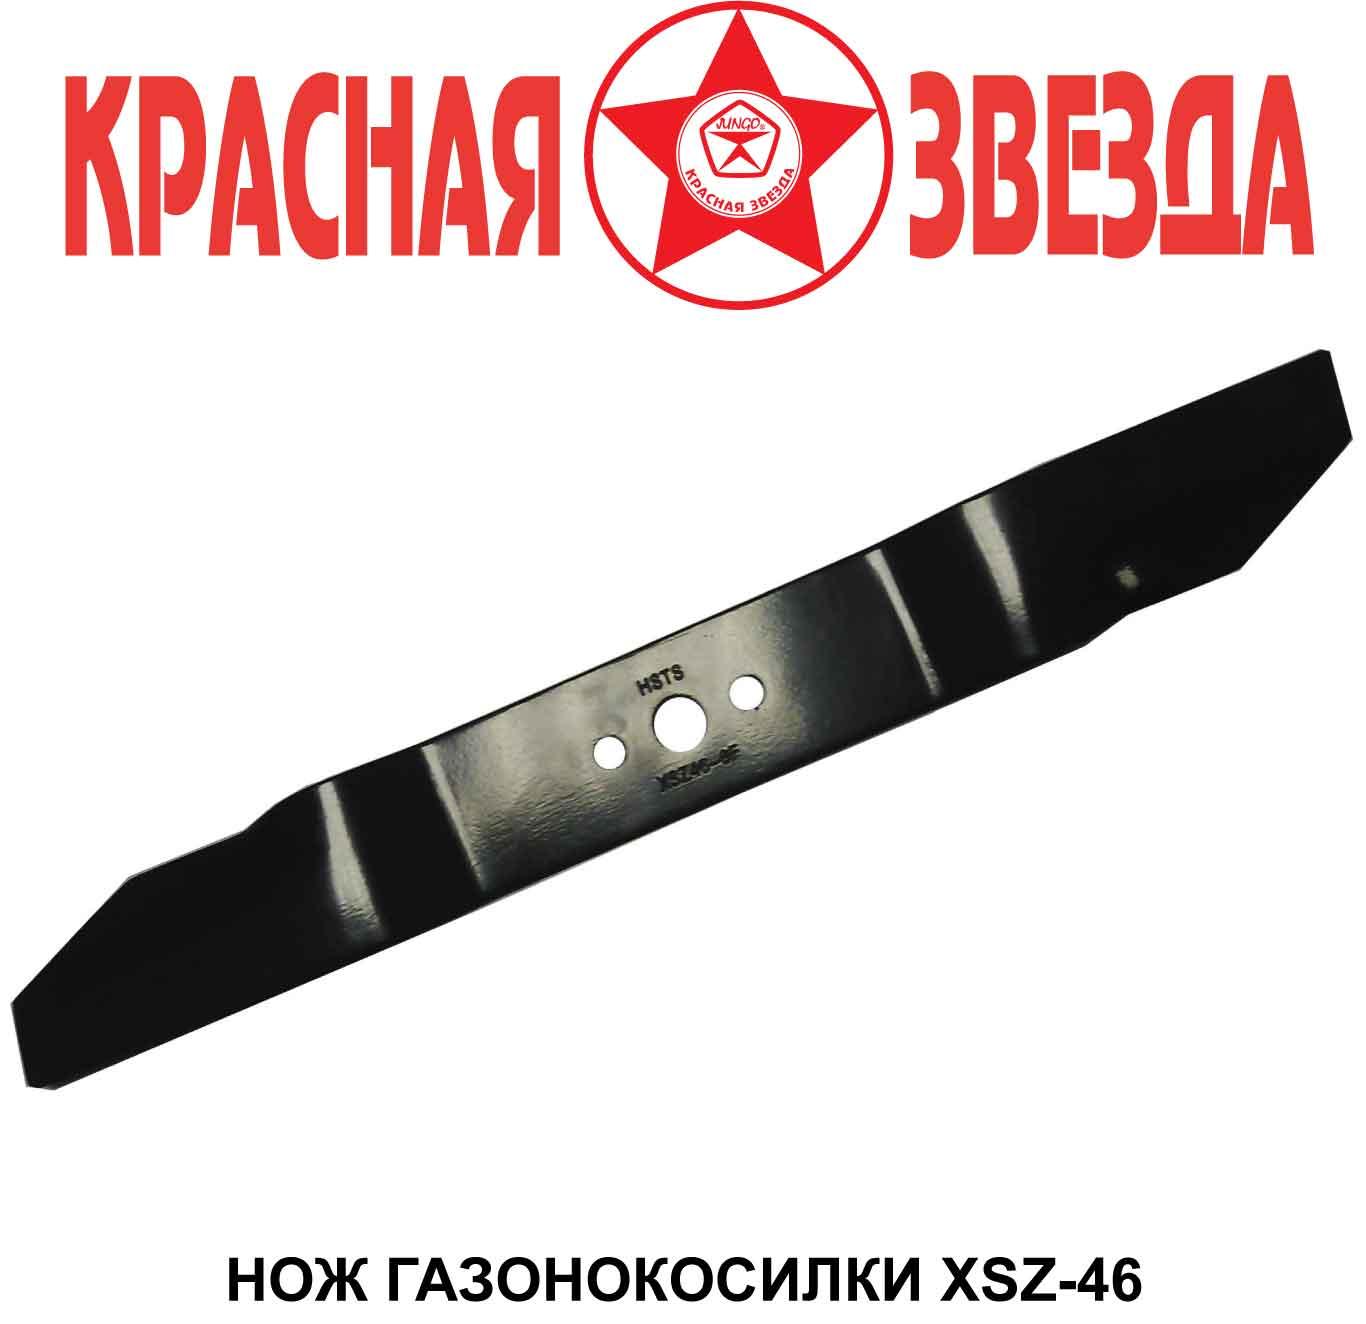 Красная Звезда Нож газонокосилки на 46 см bgk_blade